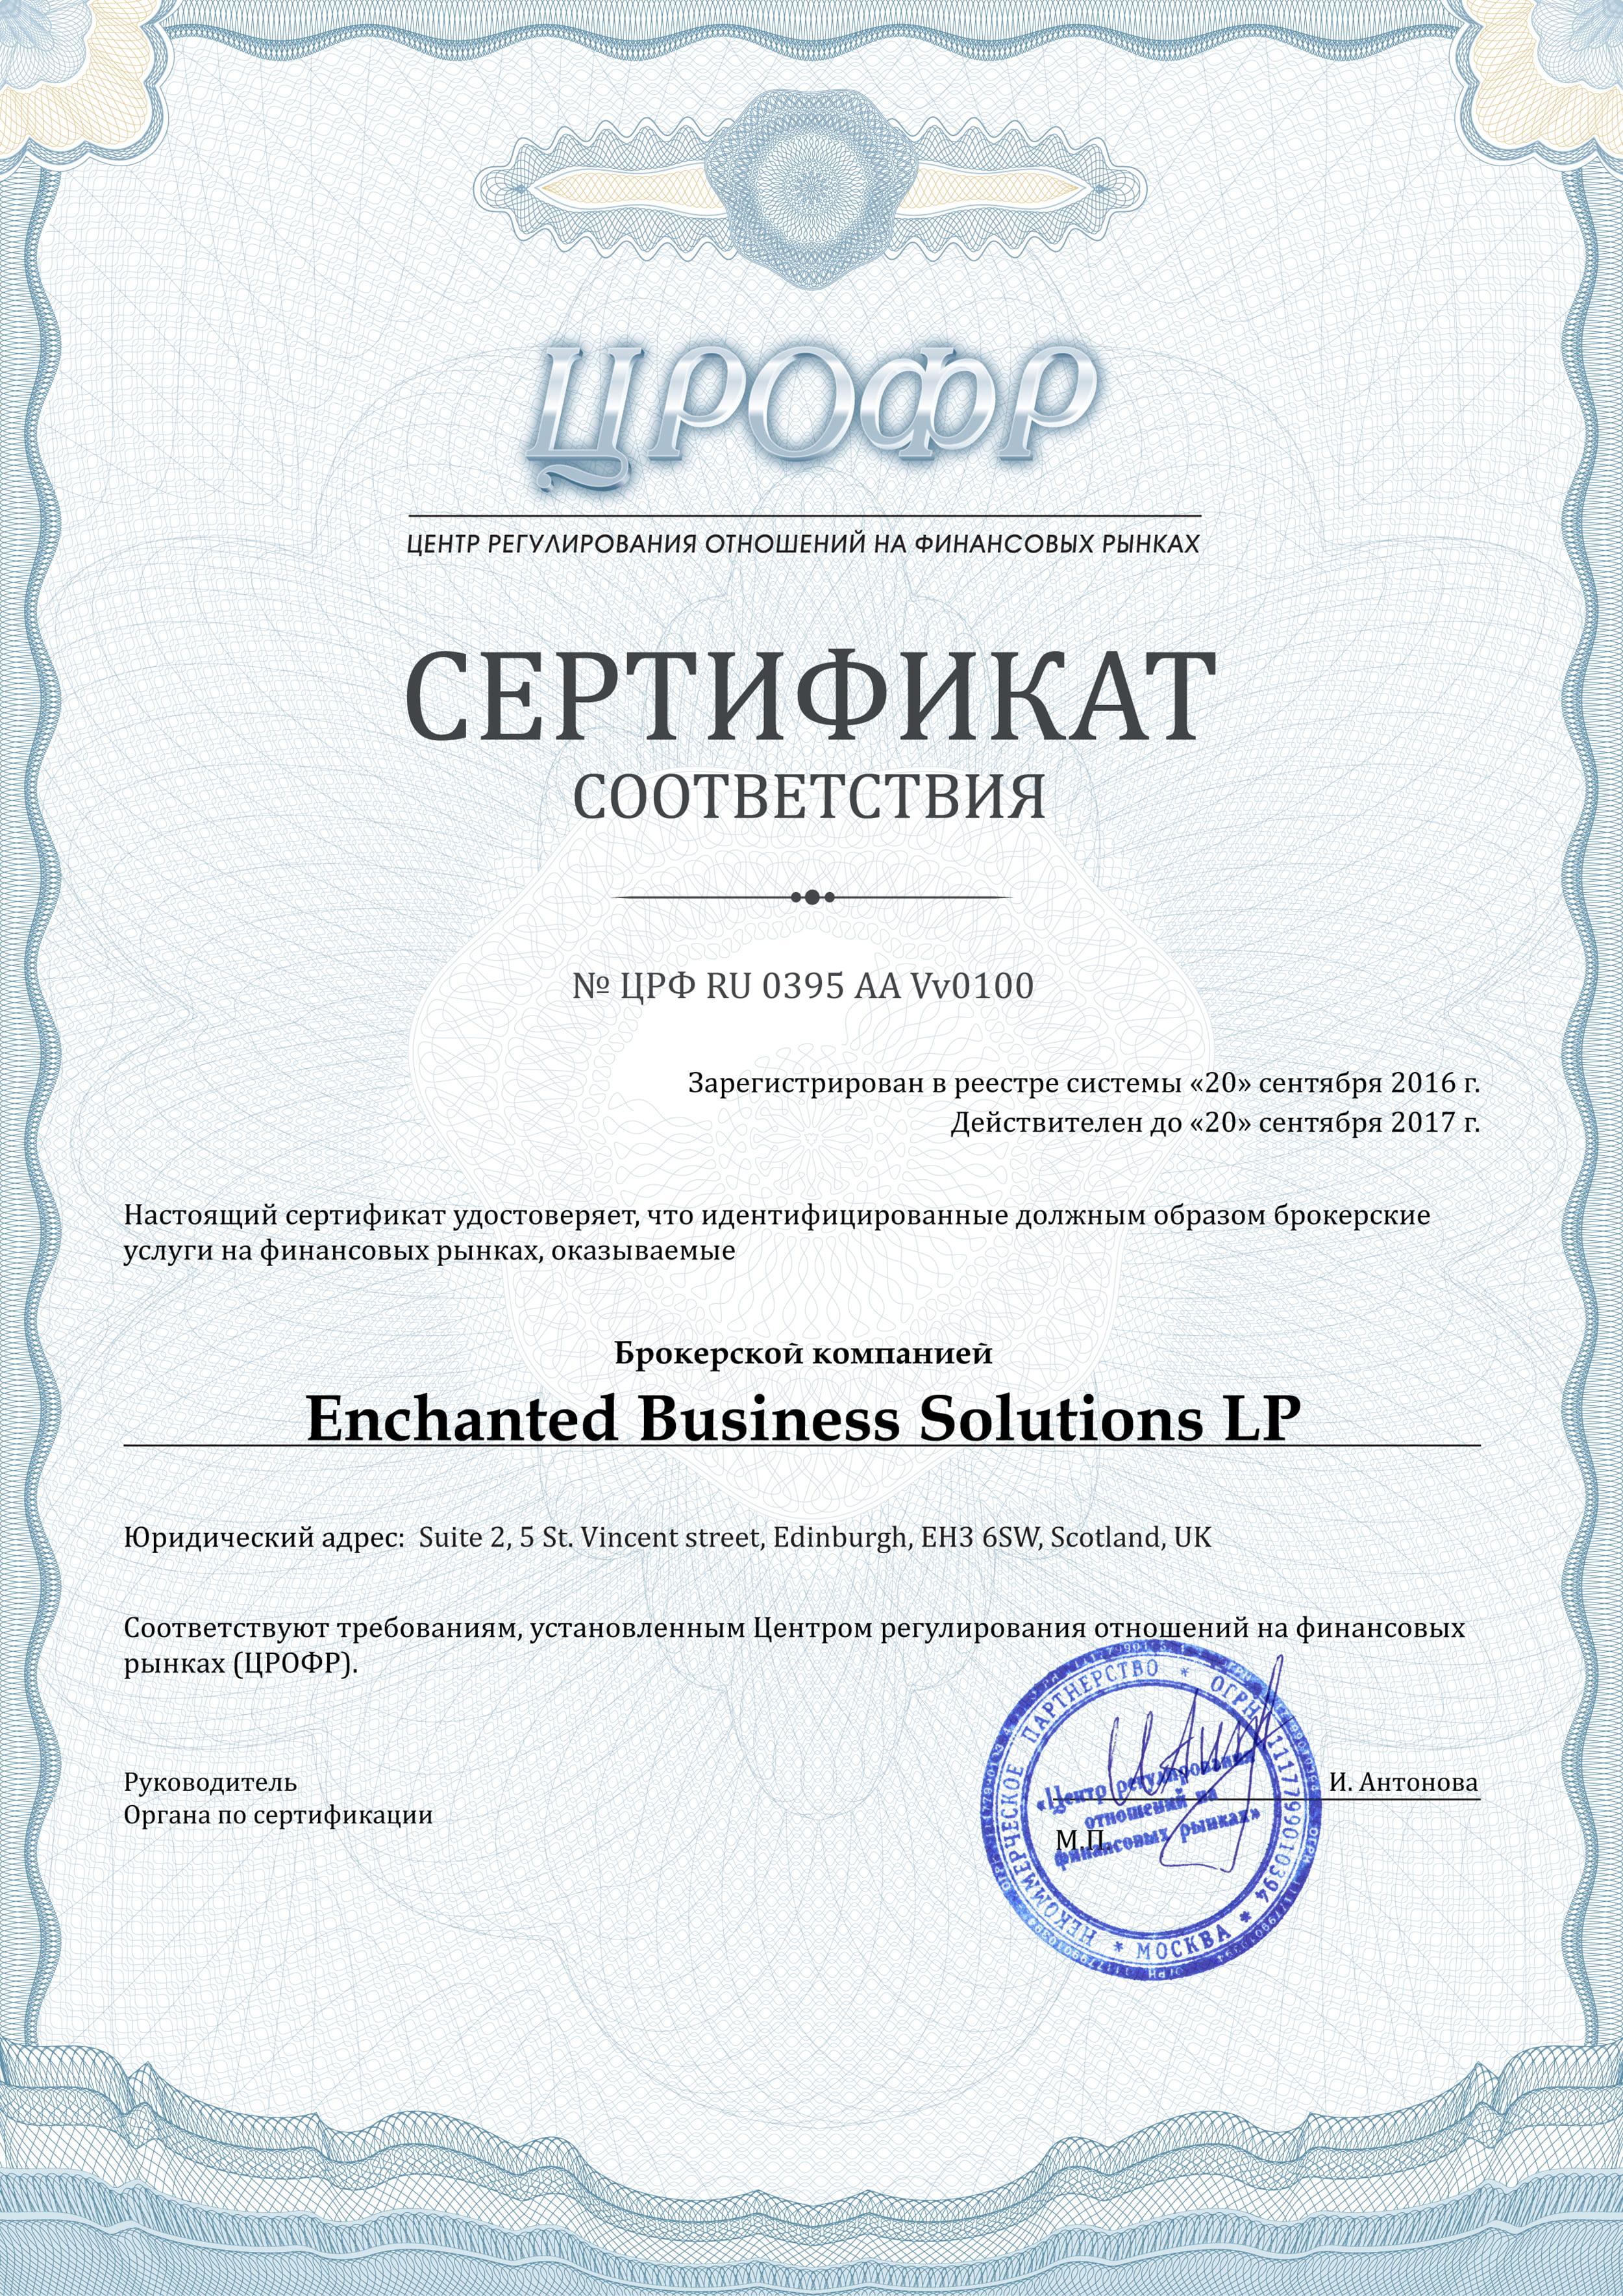 Binatex имеет сертификат ЦРОФР